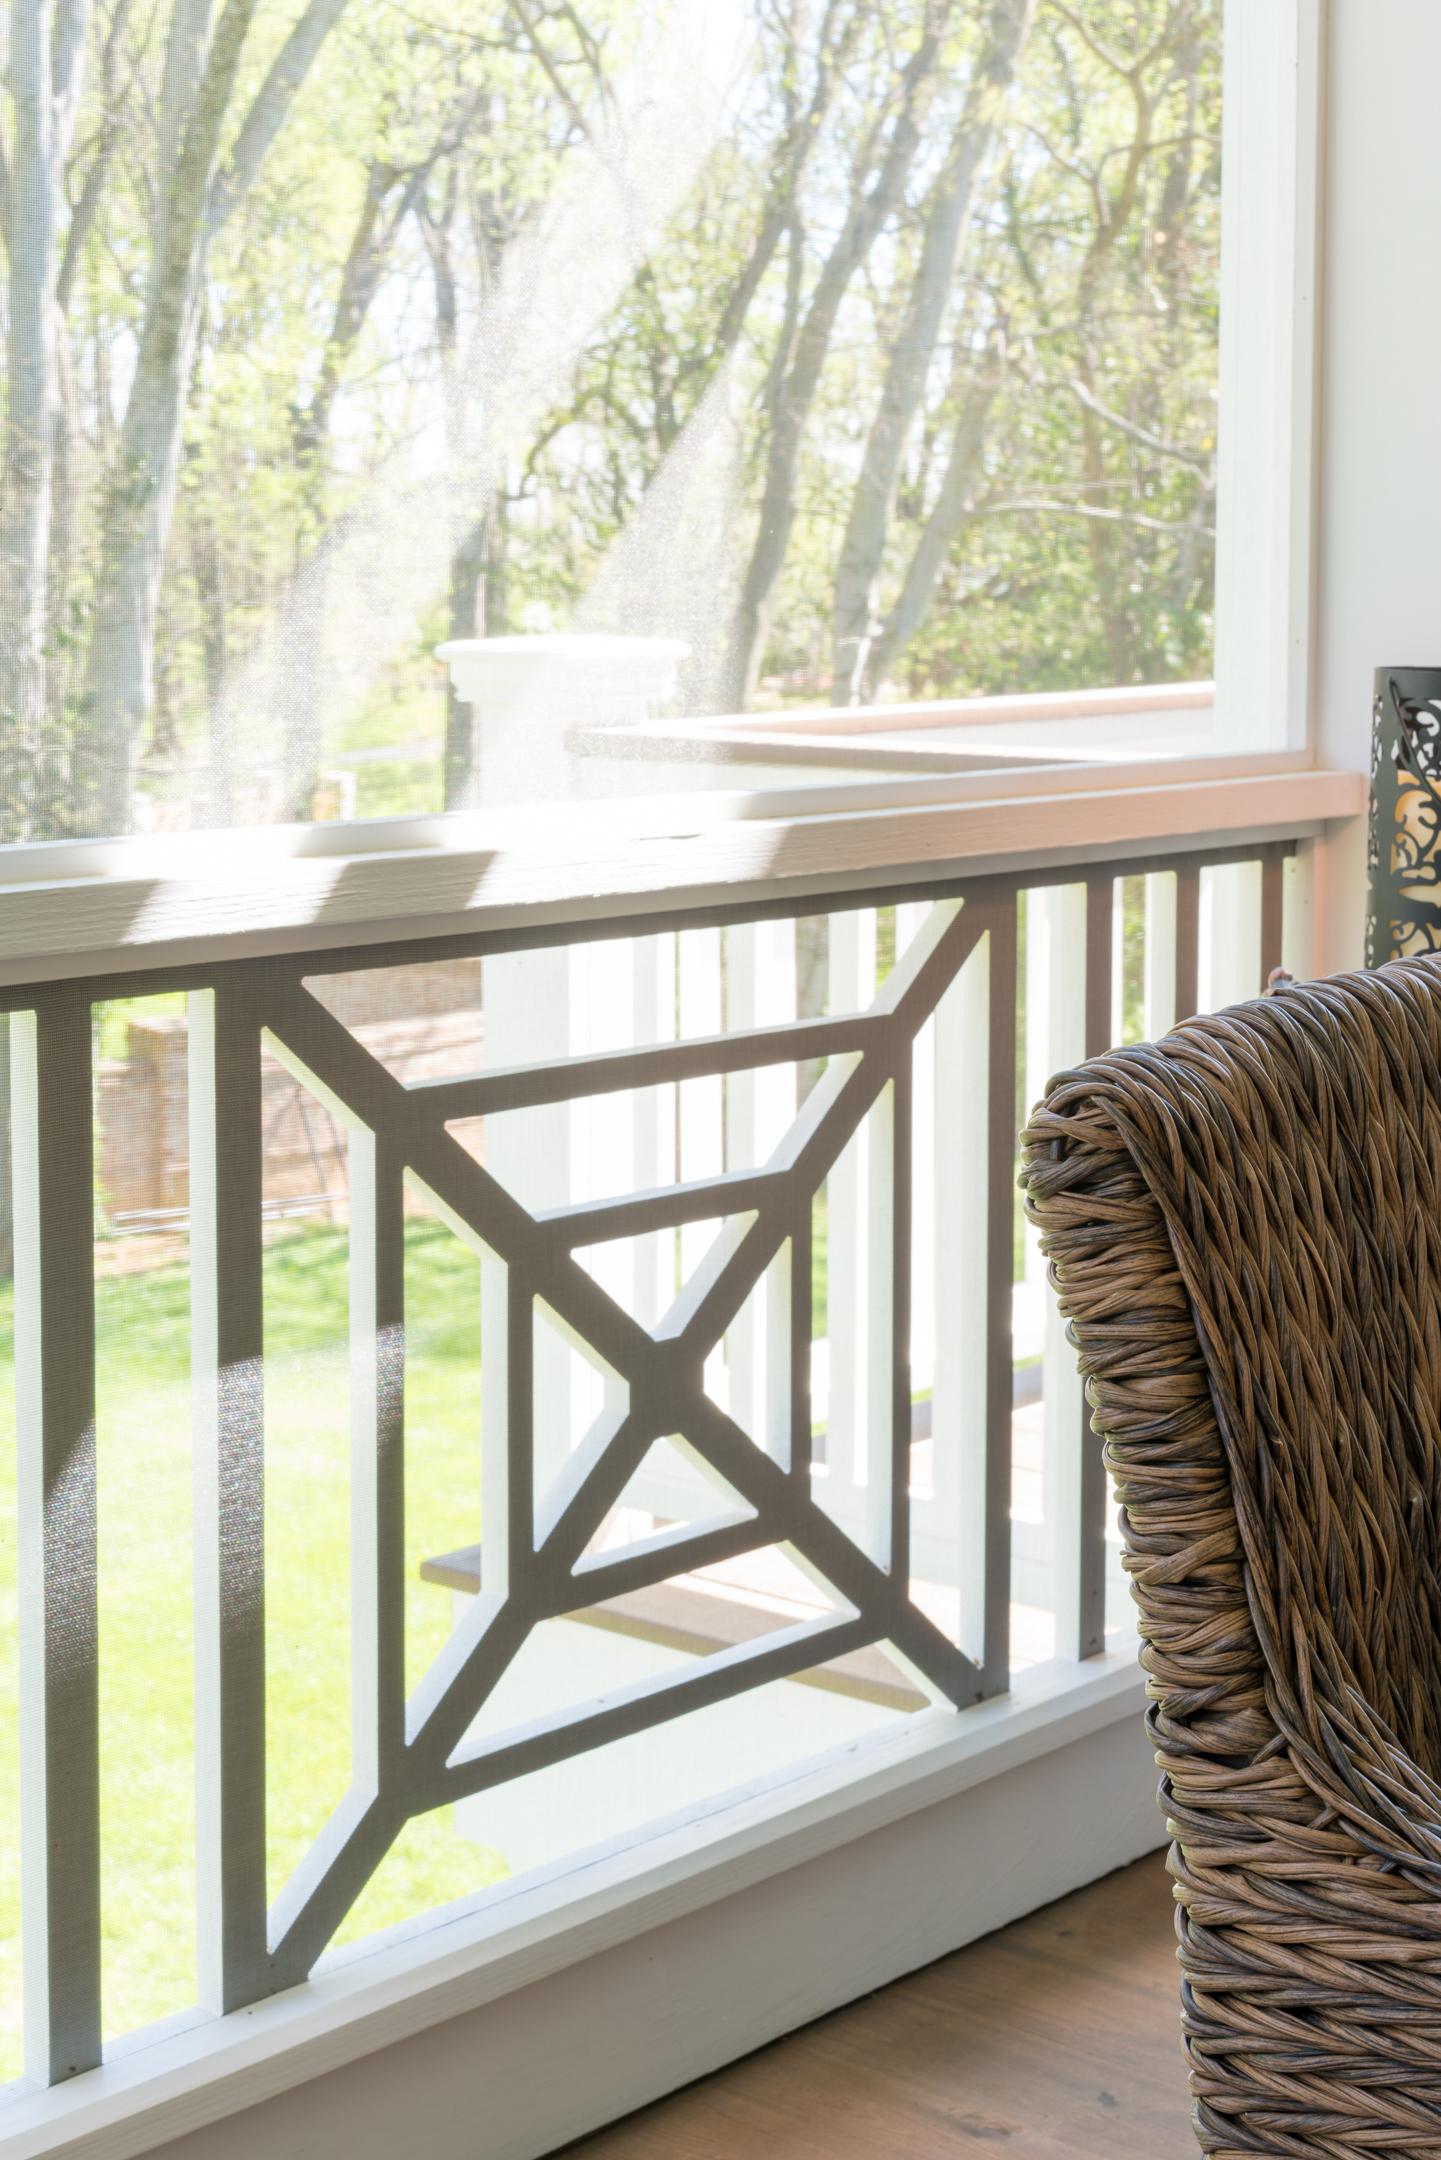 Decorative Metal Deck Railing Panels  from porchco.com